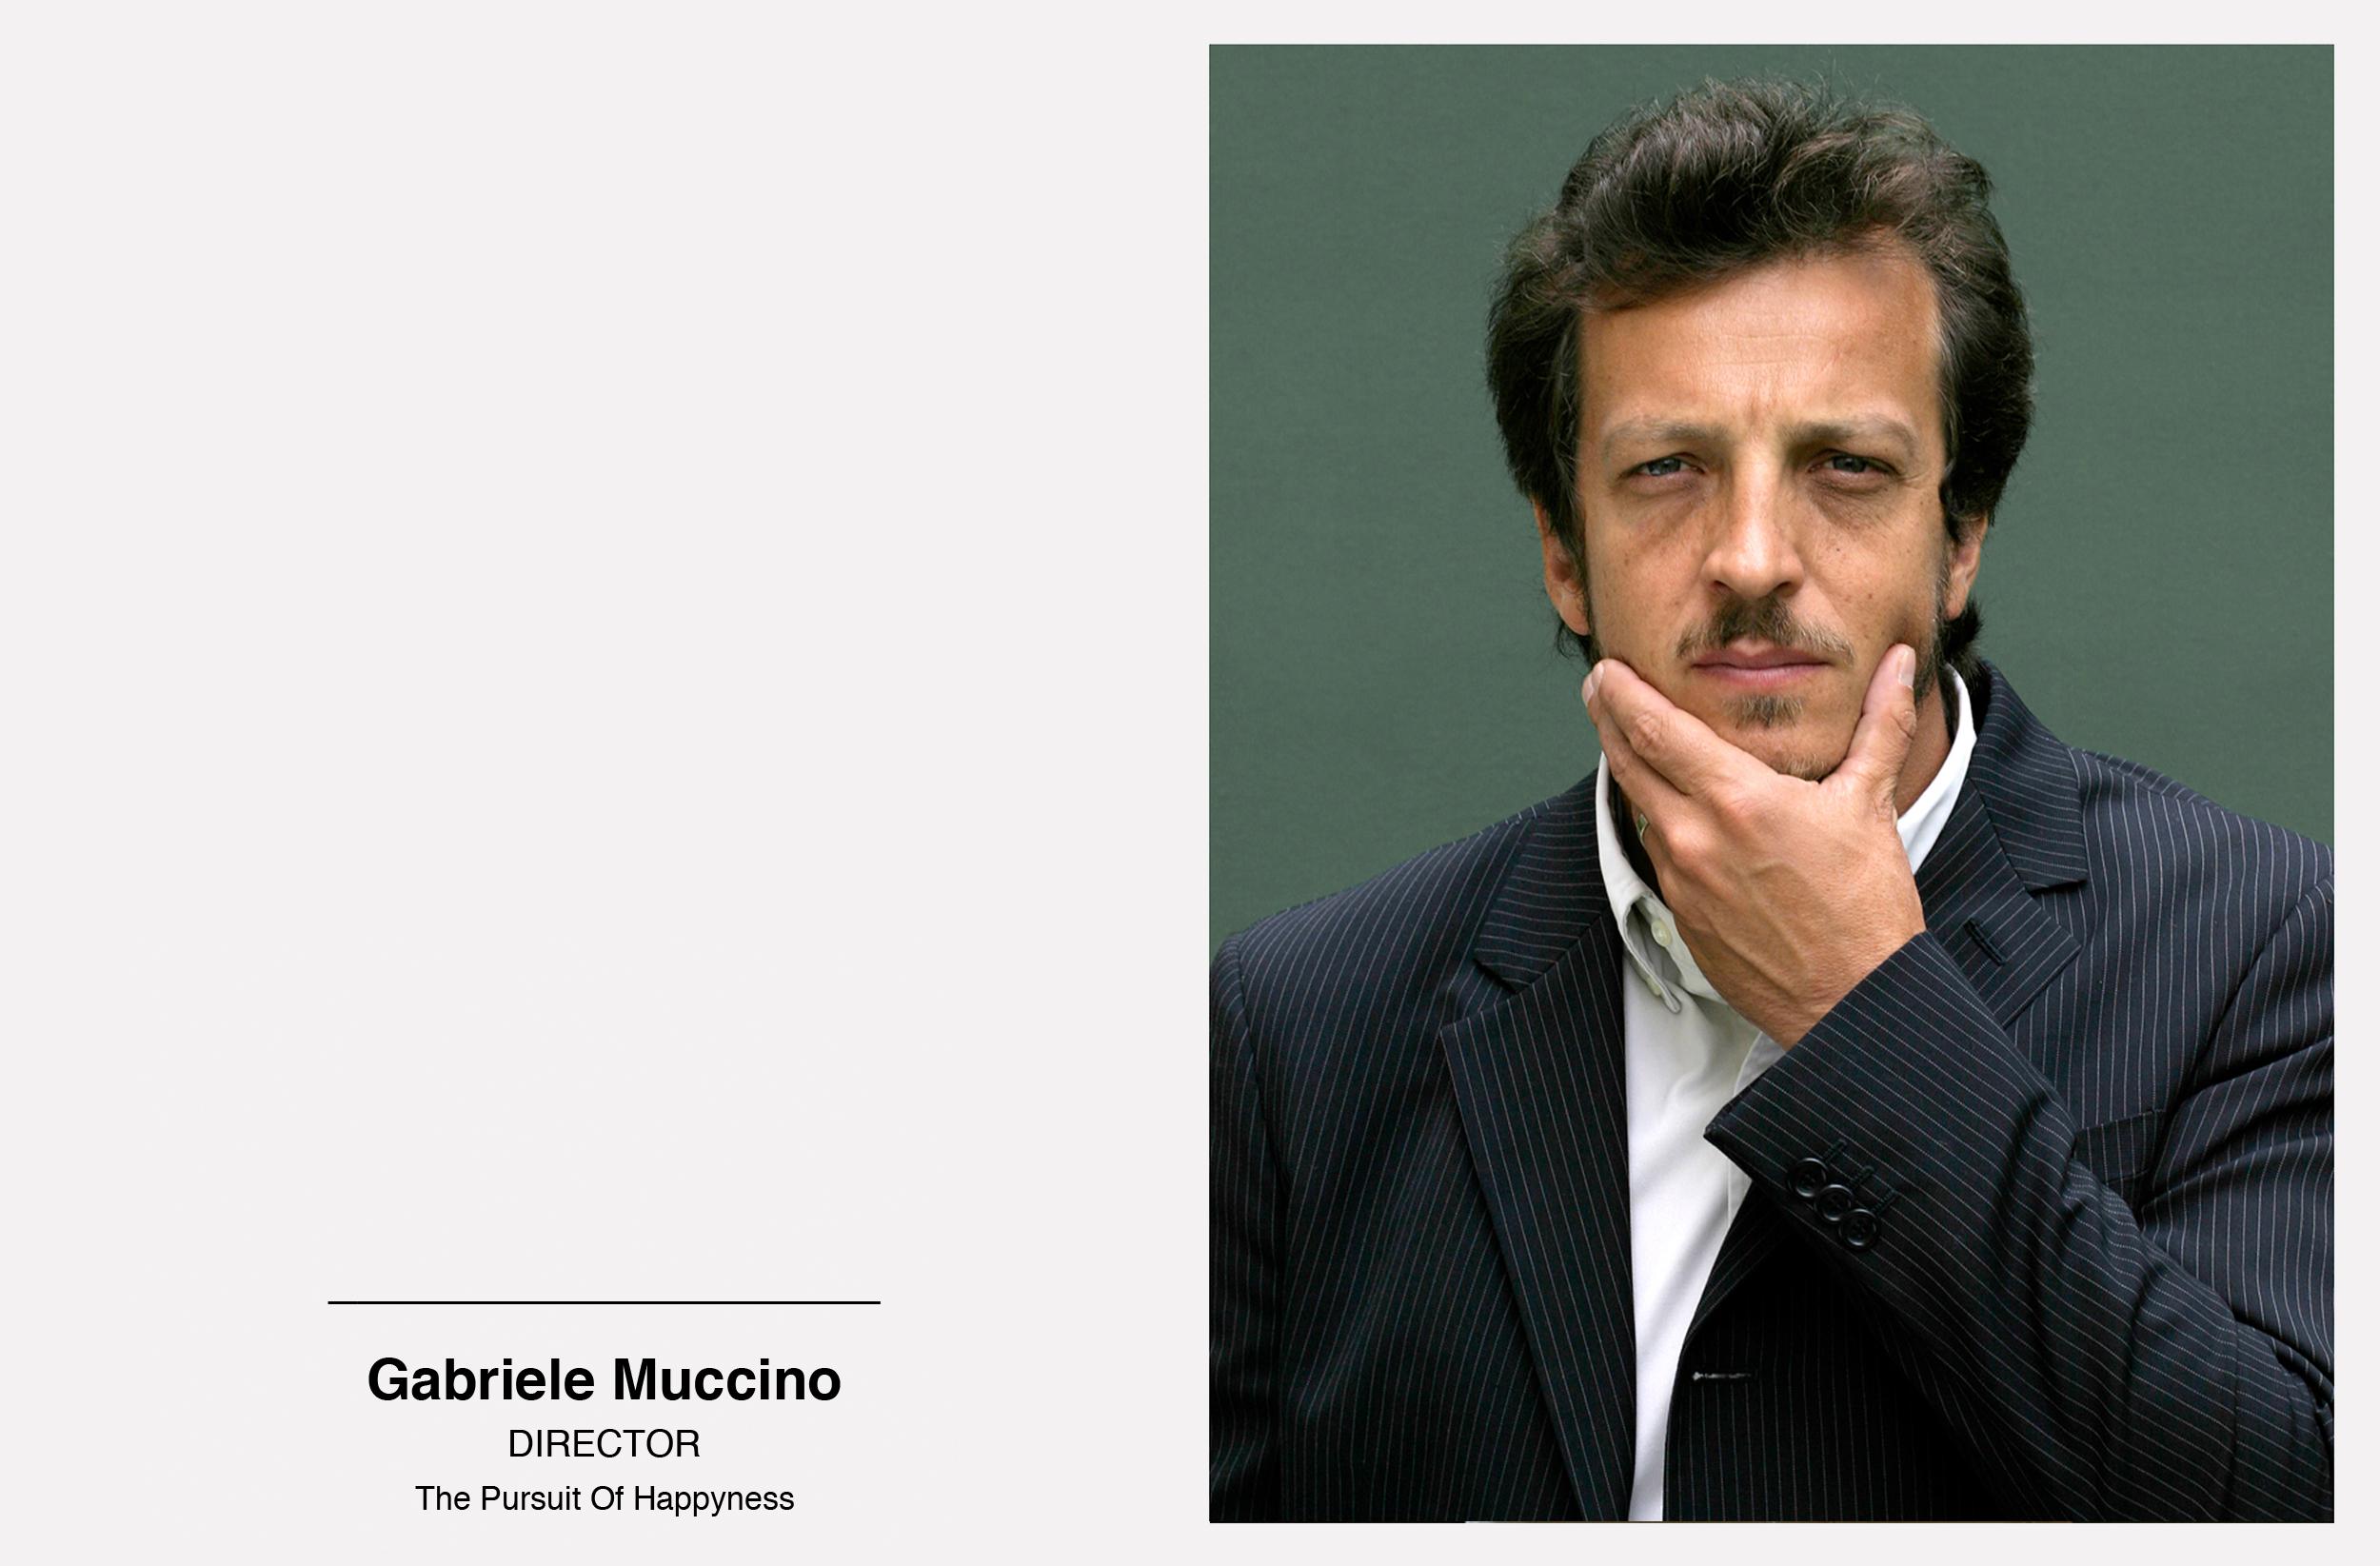 muccino.jpg